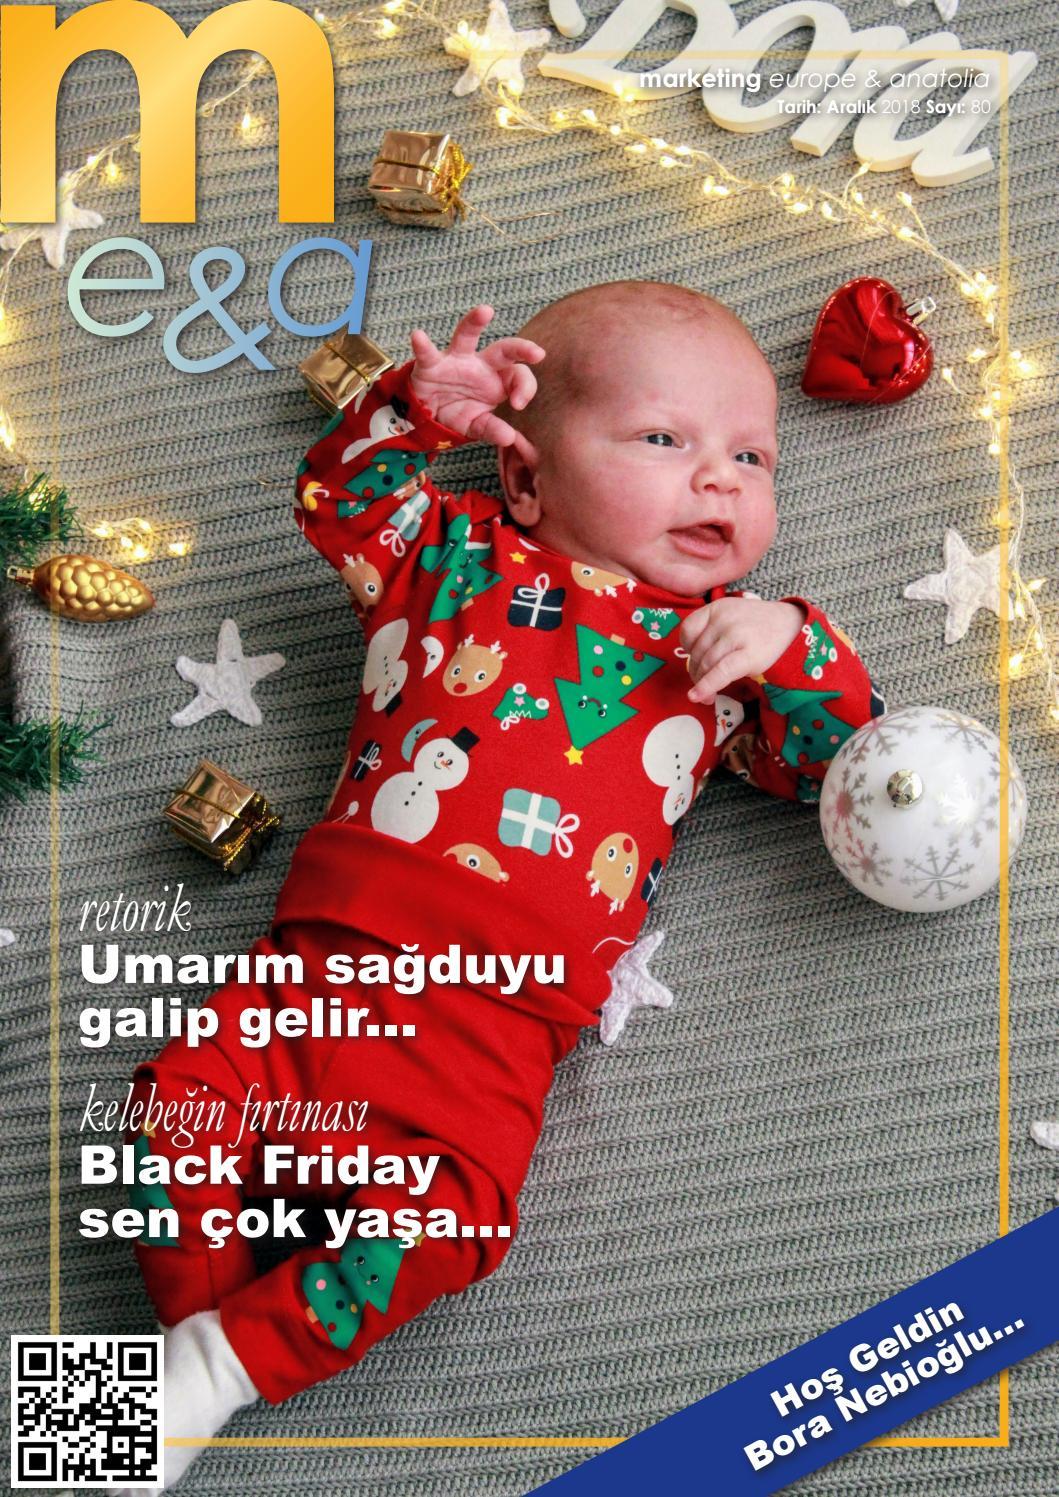 843270ee65fee marketing europe & anatolia Sayı: 080 by Eksantrik Produksiyon - issuu